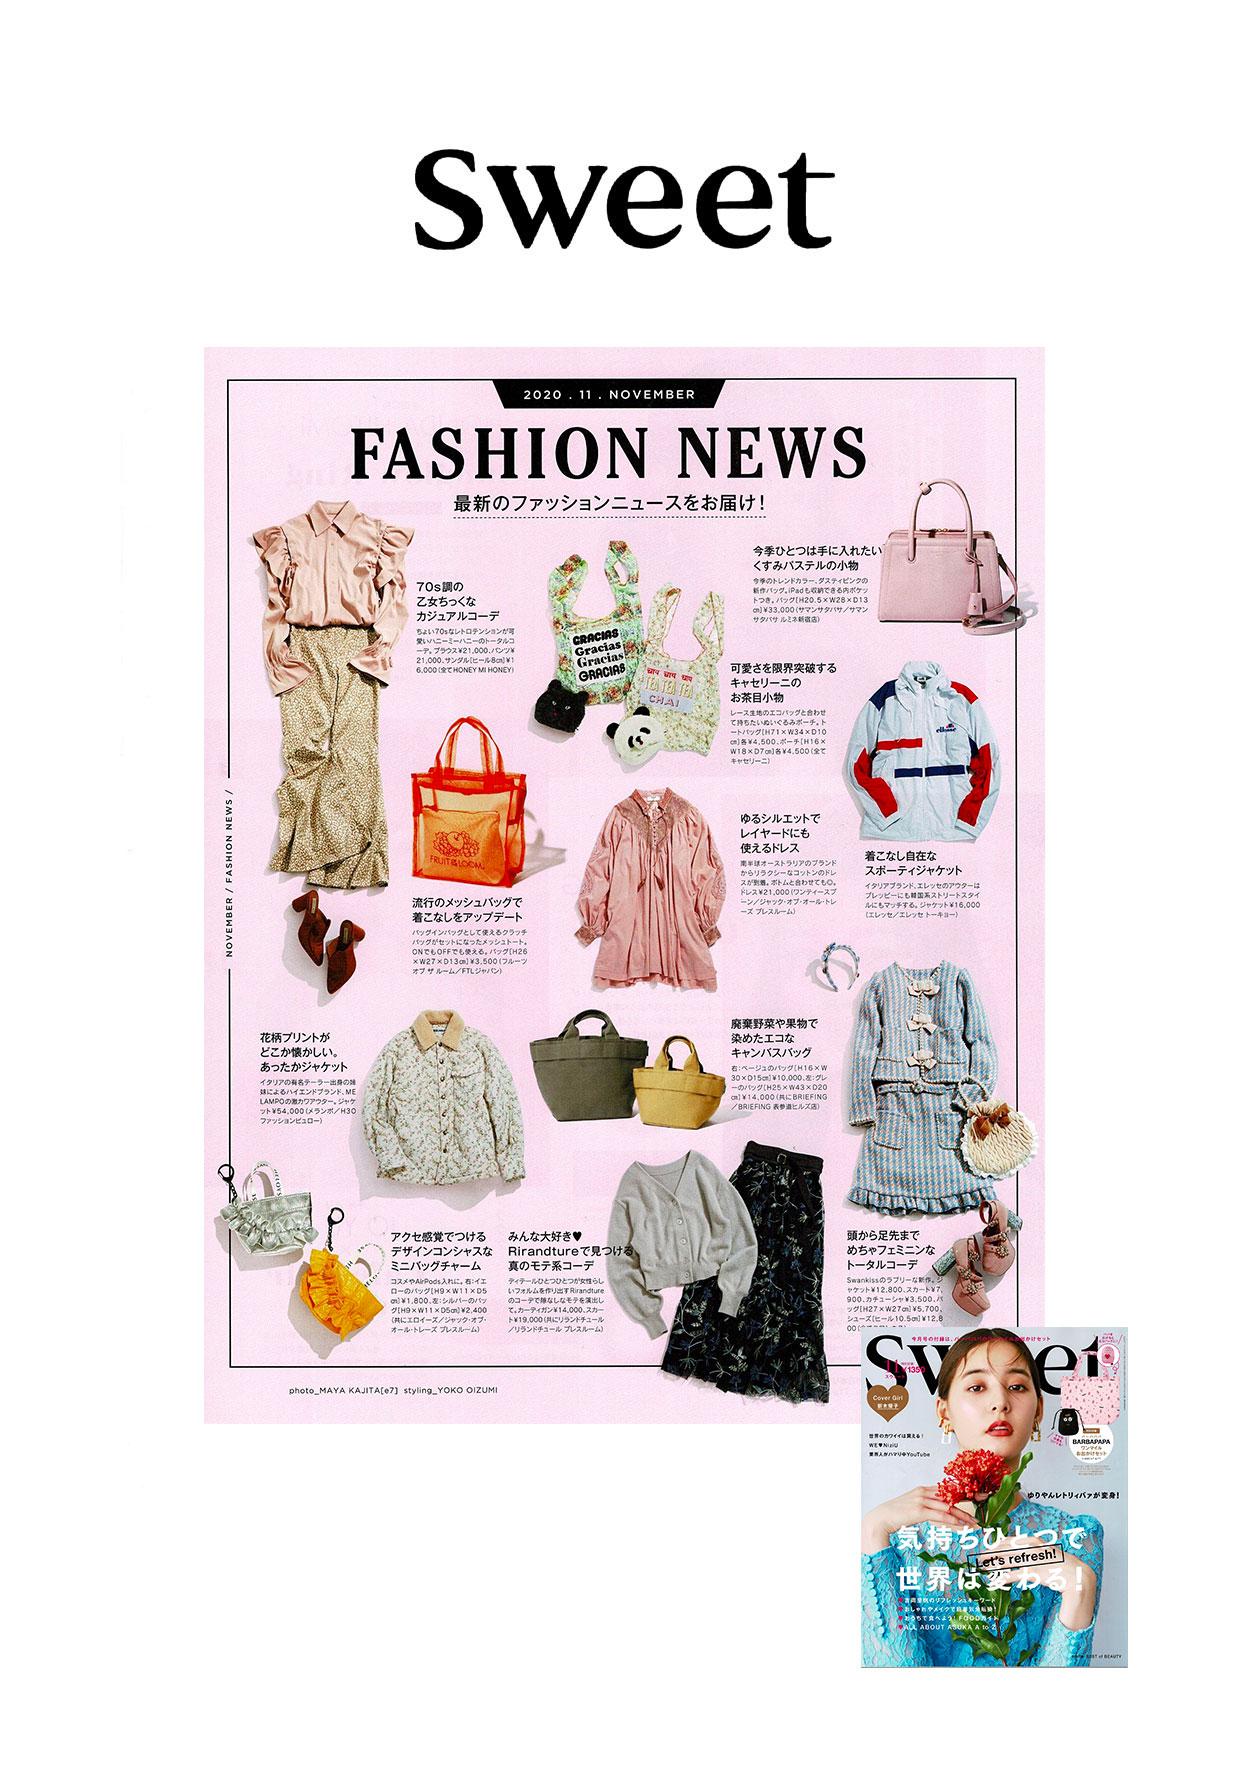 melampo-press-sweet-japan-magazine4